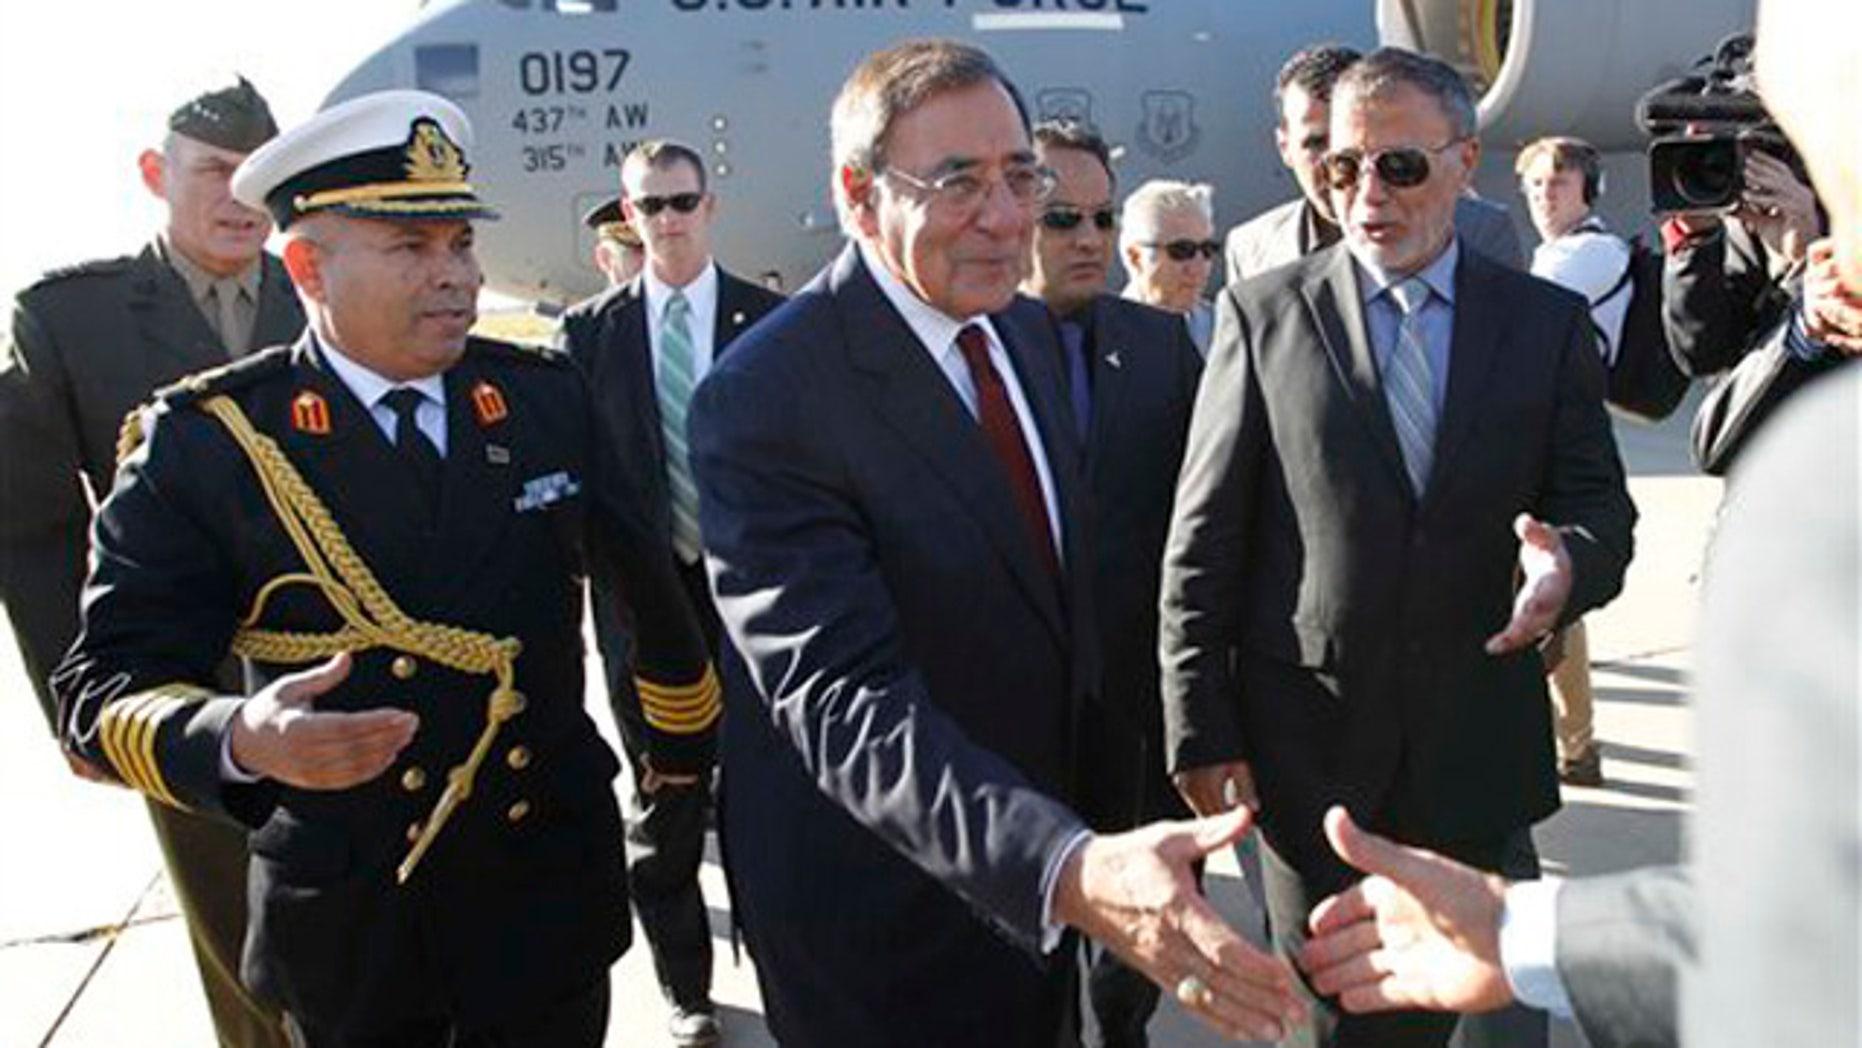 Dec. 17, 2011: Defense Secretary Leon Panetta greets officials in Tripoli, Libya.